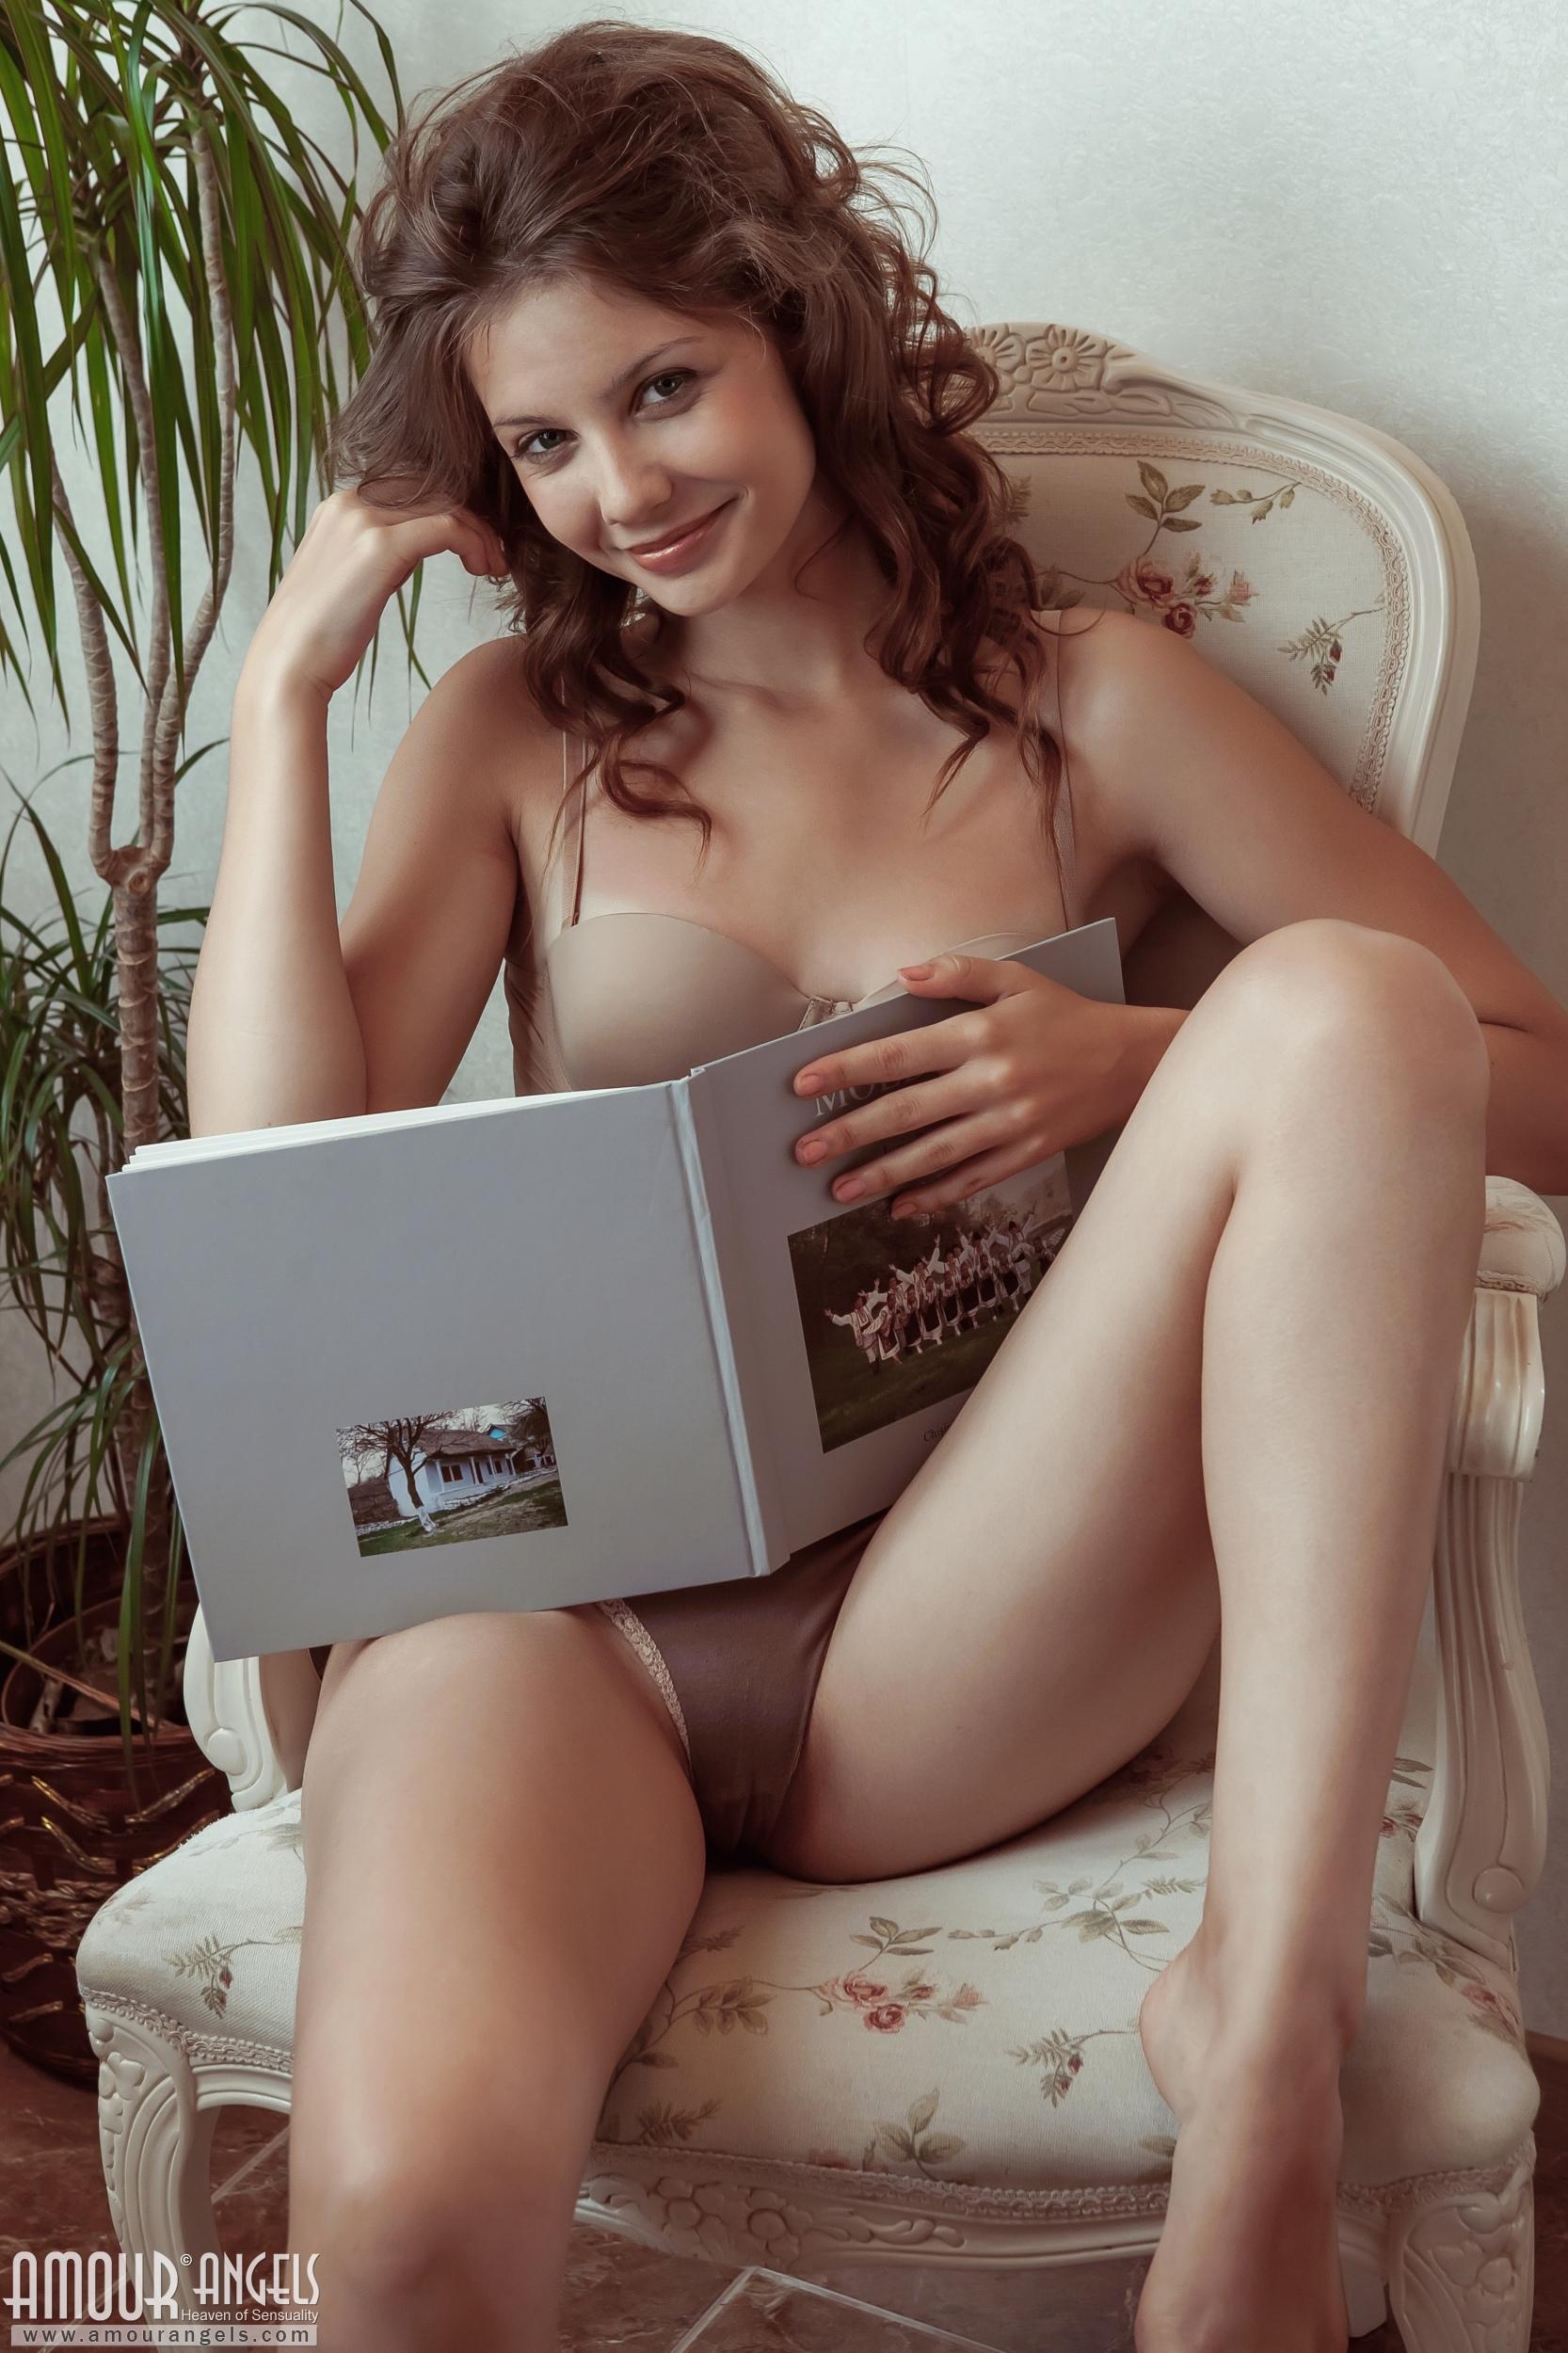 girl amour angel naked